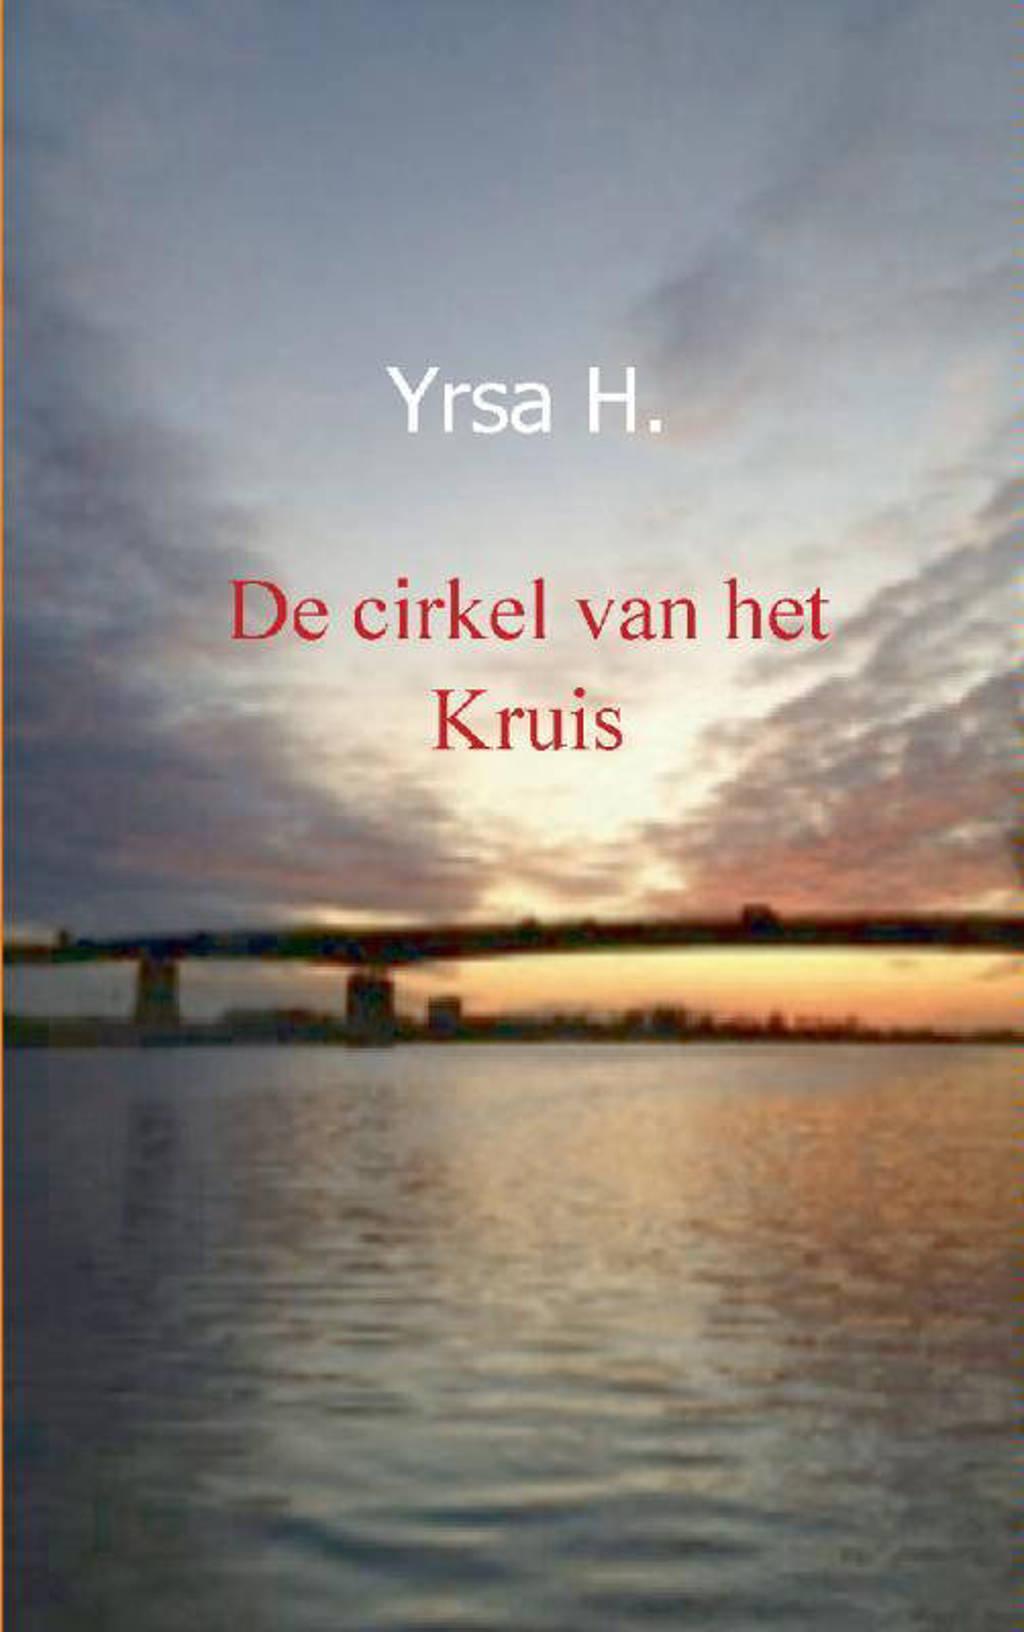 De cirkel van het kruis - Yrsa H